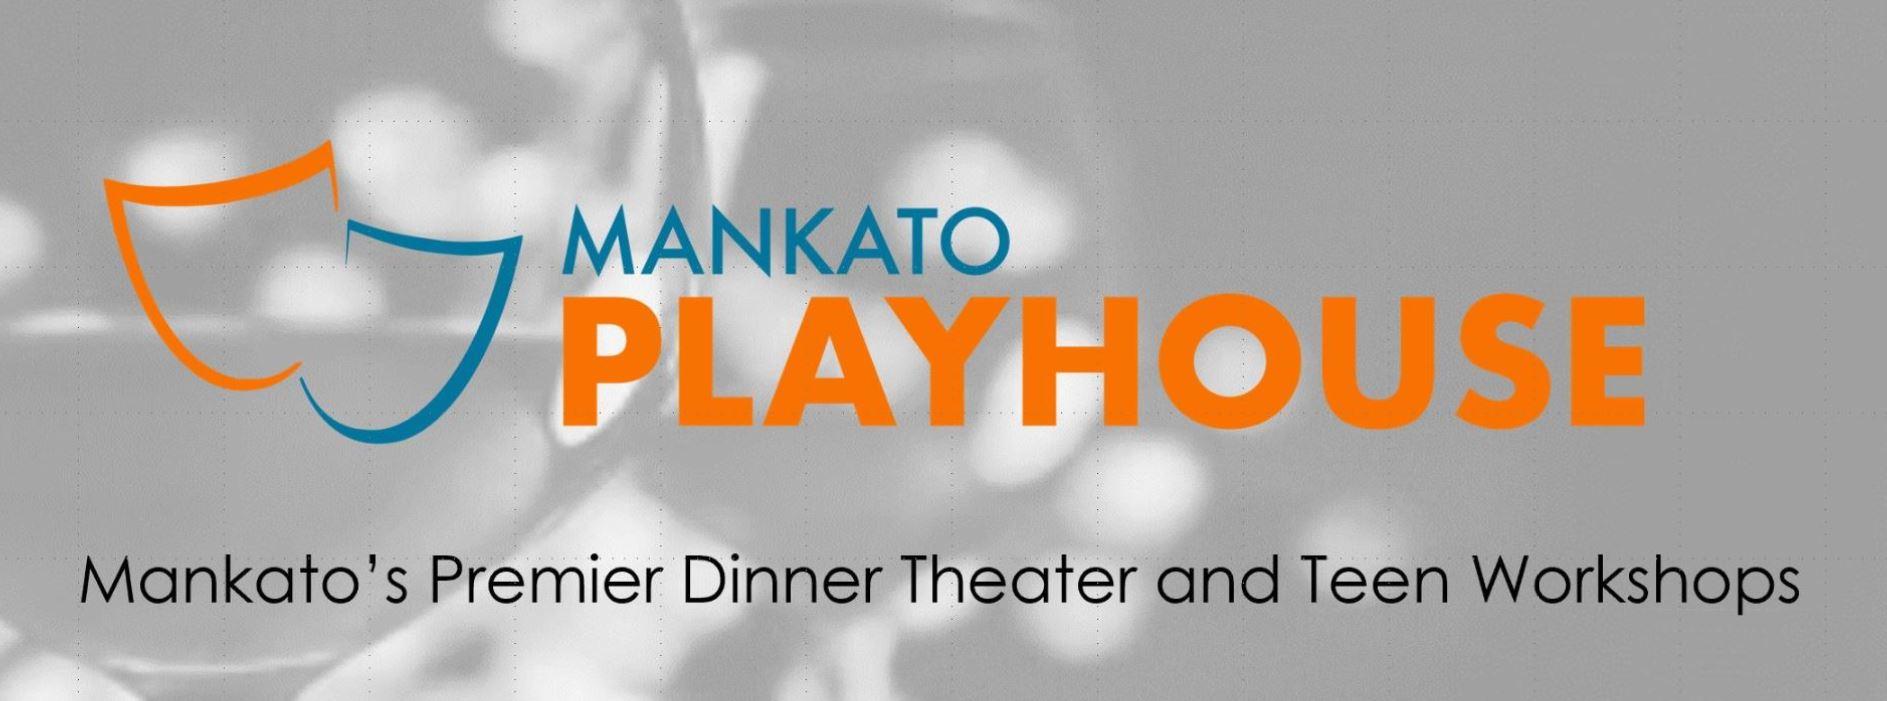 Davori Productions Co. (Mankato Playhouse) Box Office